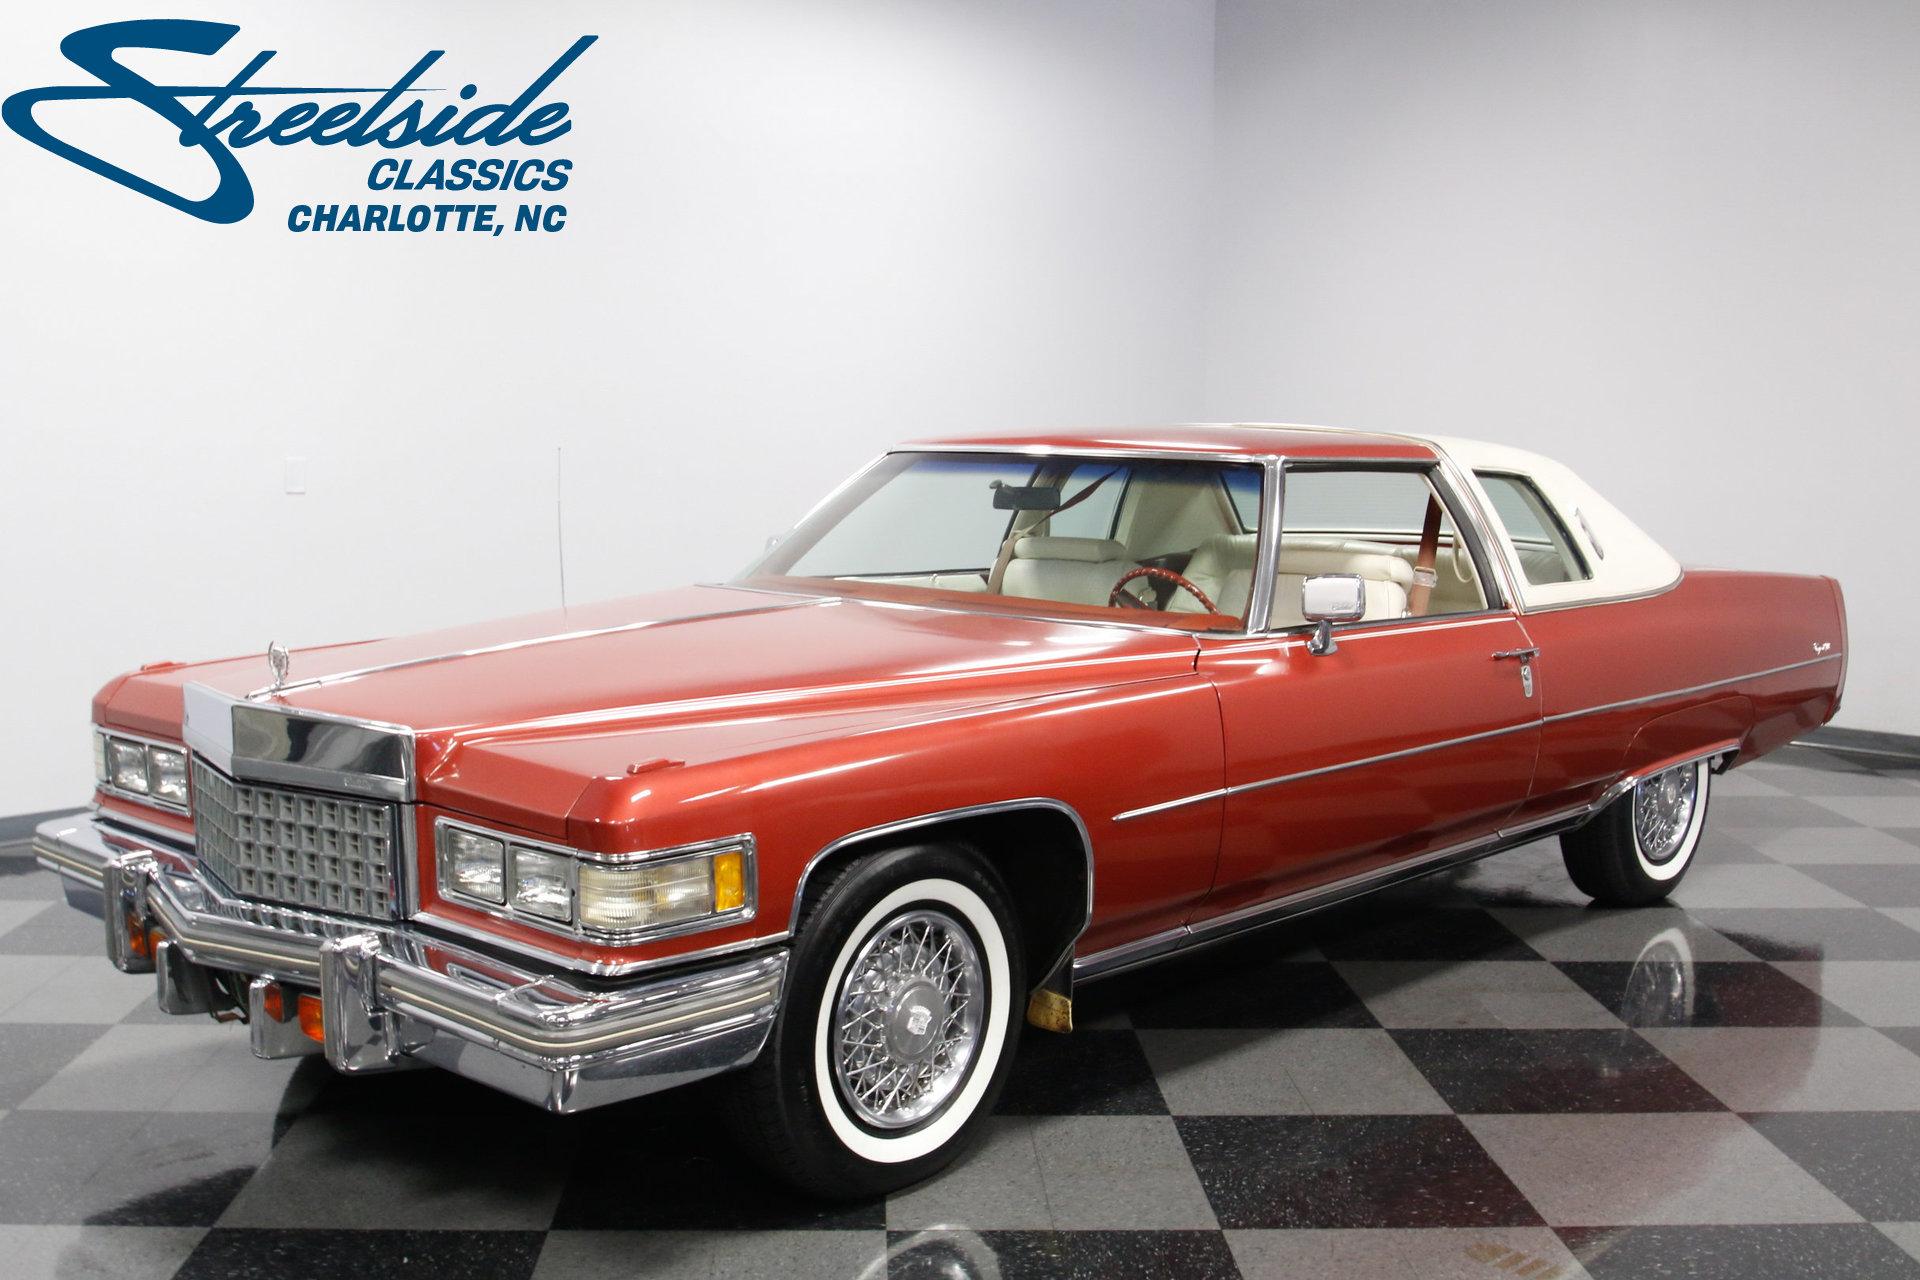 1976 Cadillac Coupe Deville For Sale 75163 Mcg